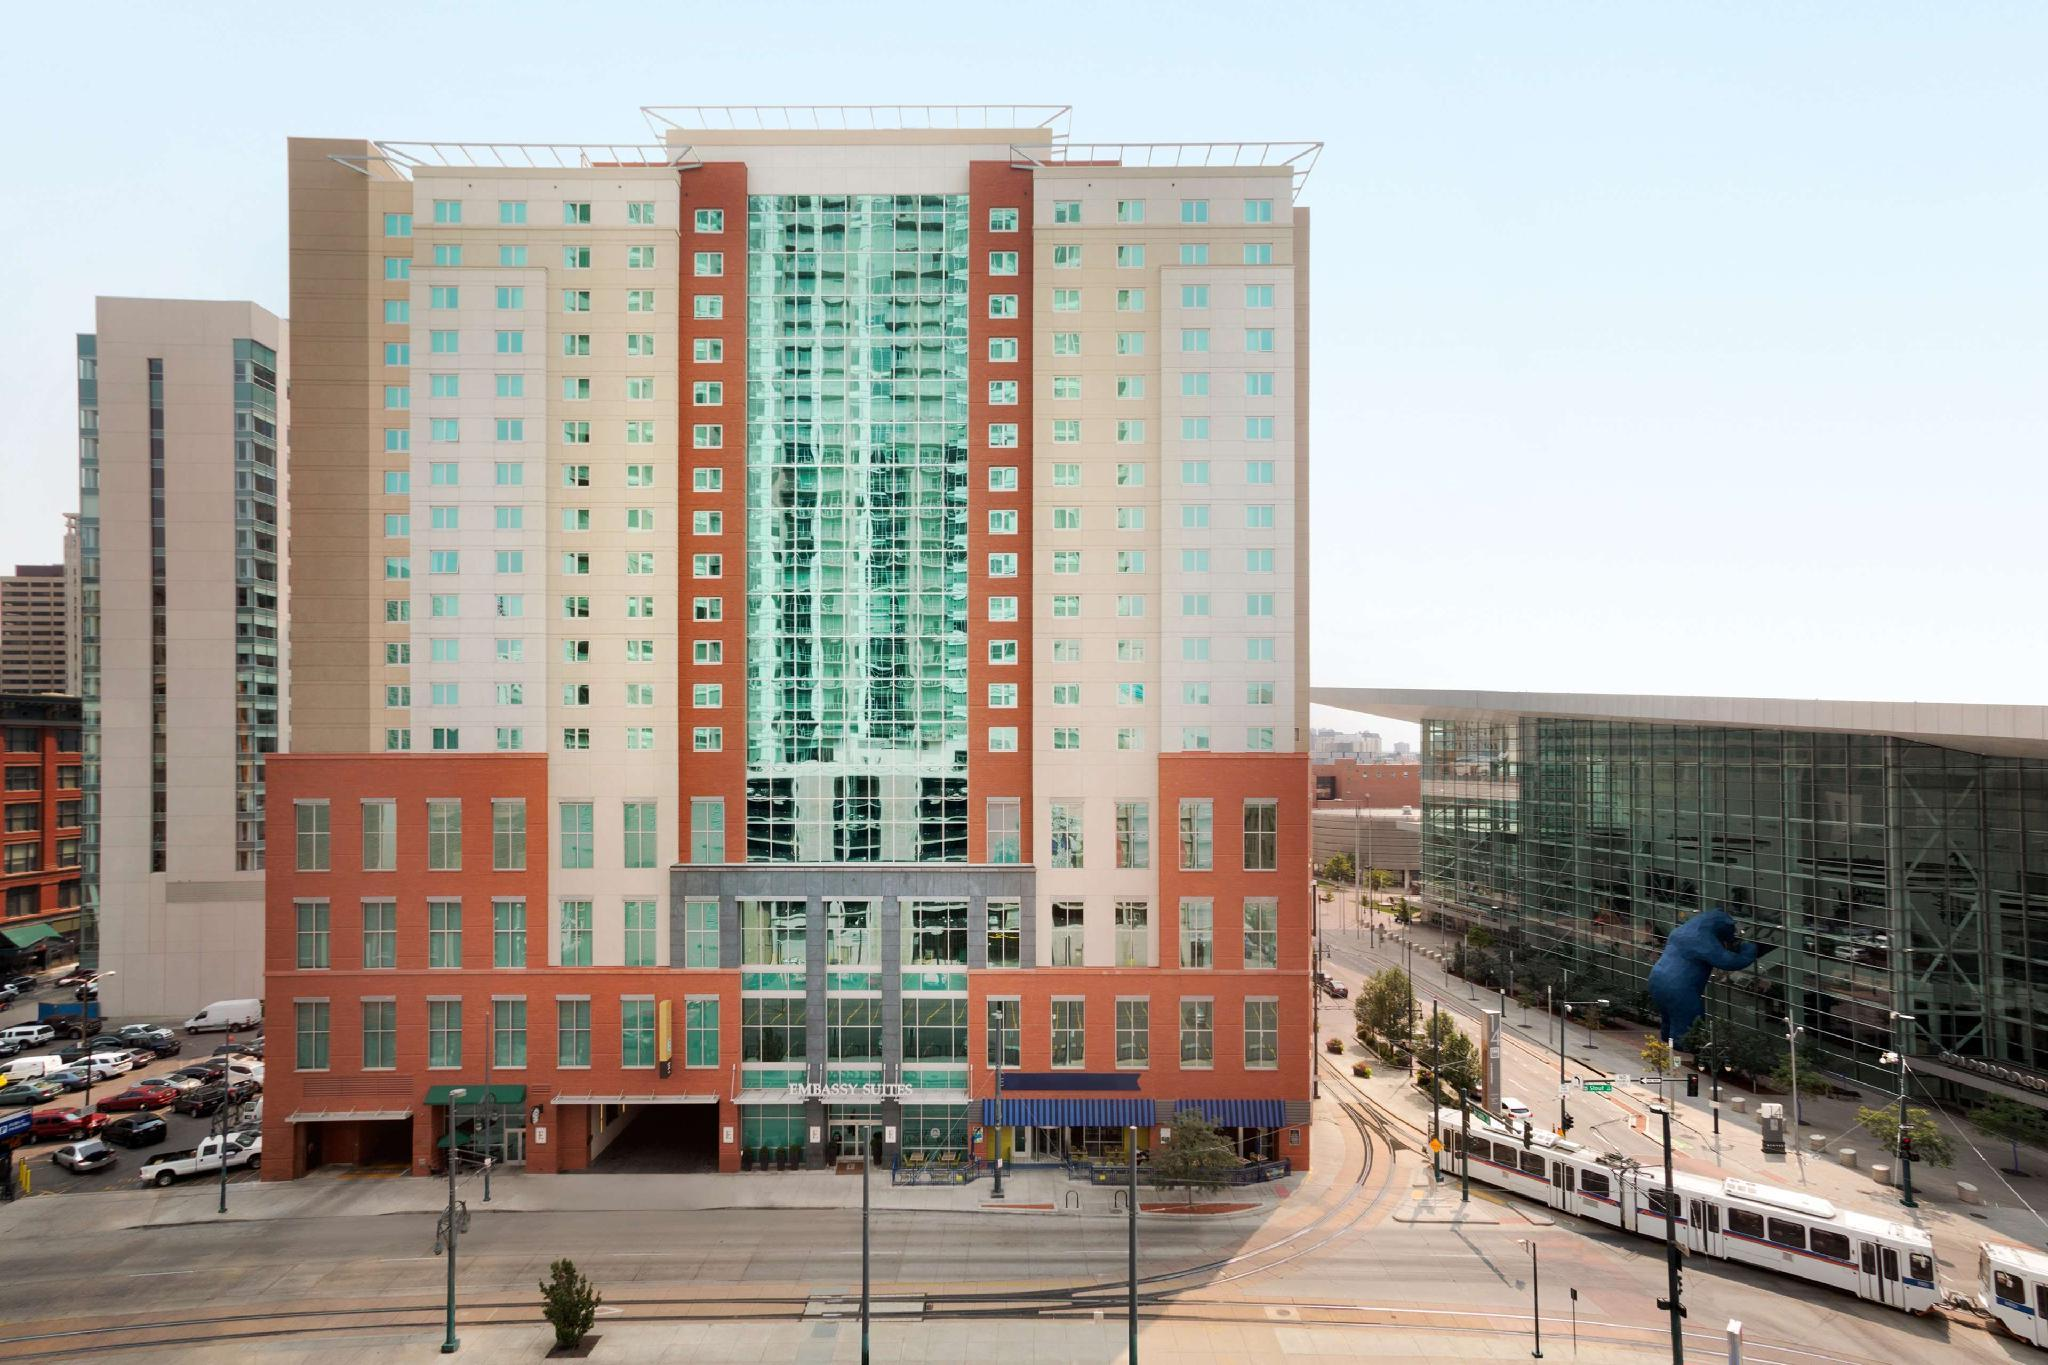 Embassy Suites Hotel Denver Downtown Convention Center